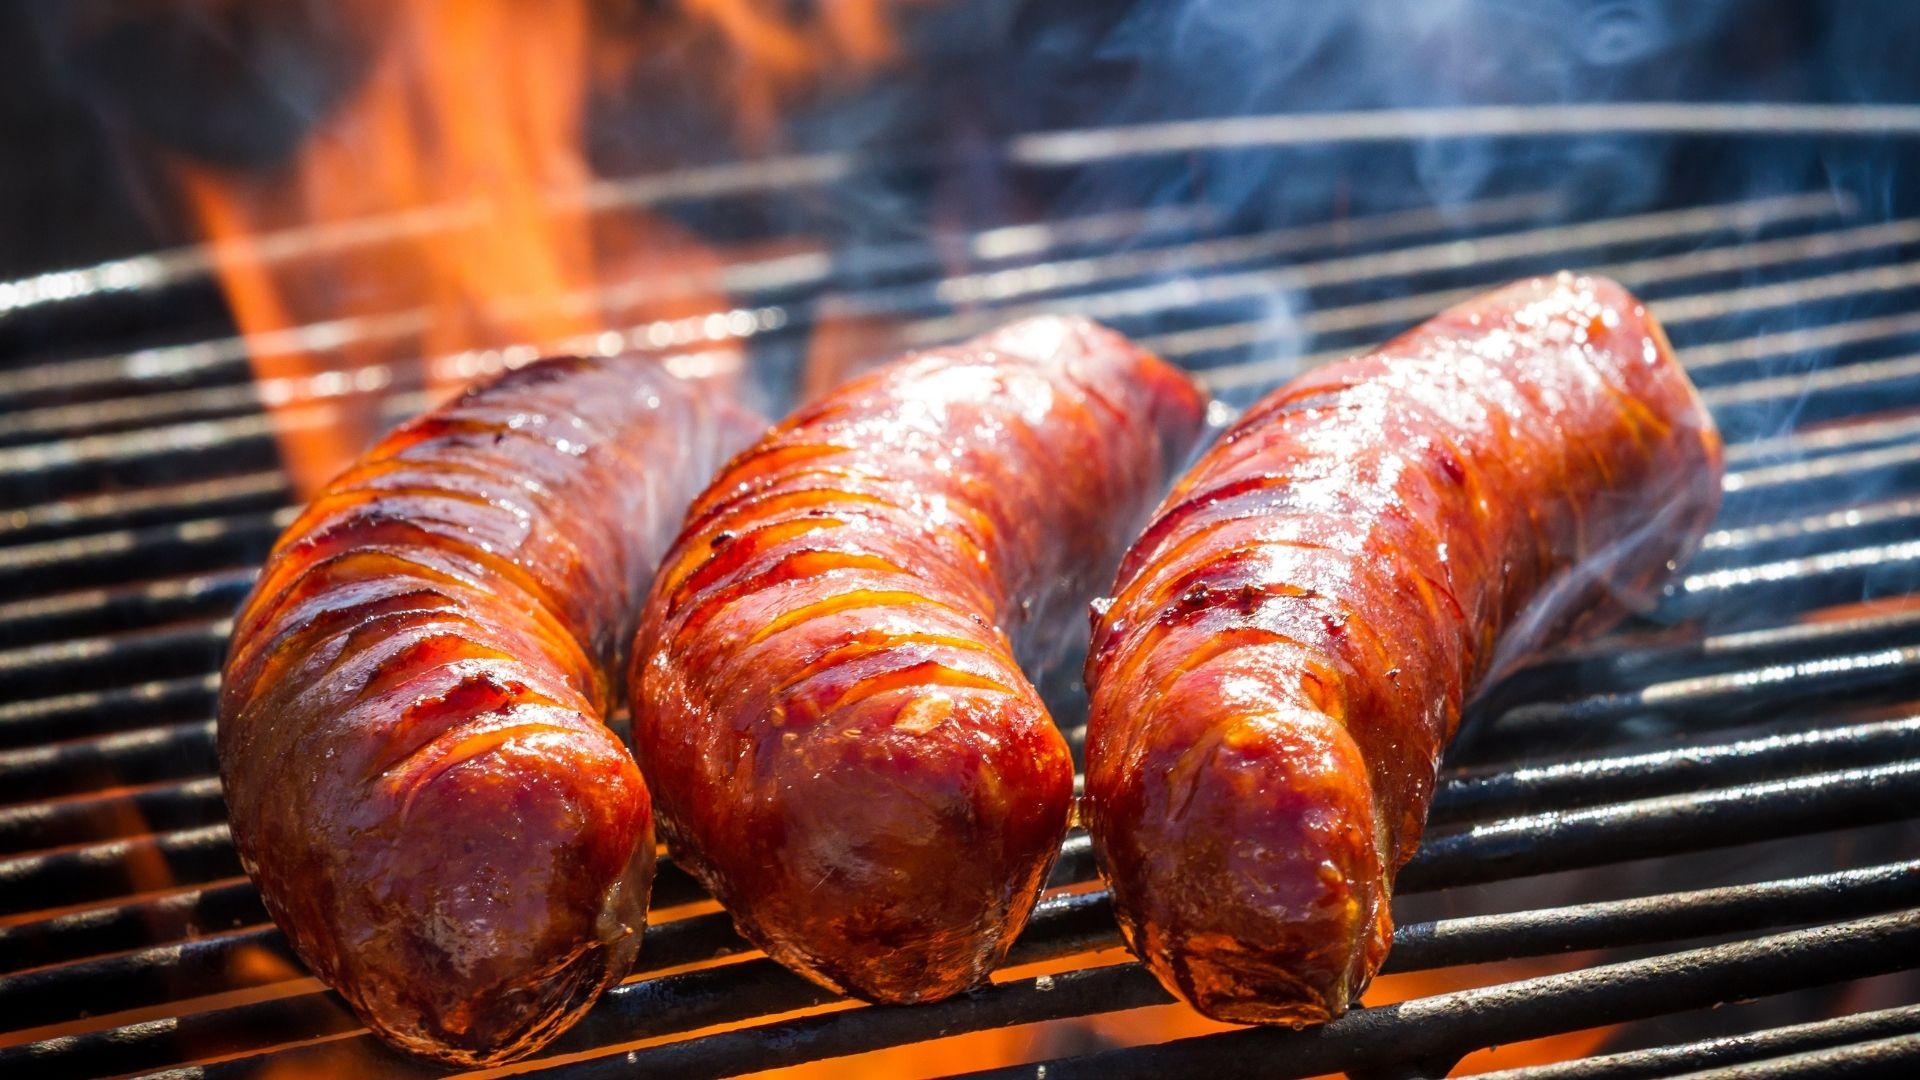 Image of Smokey Denmark's Barbecue